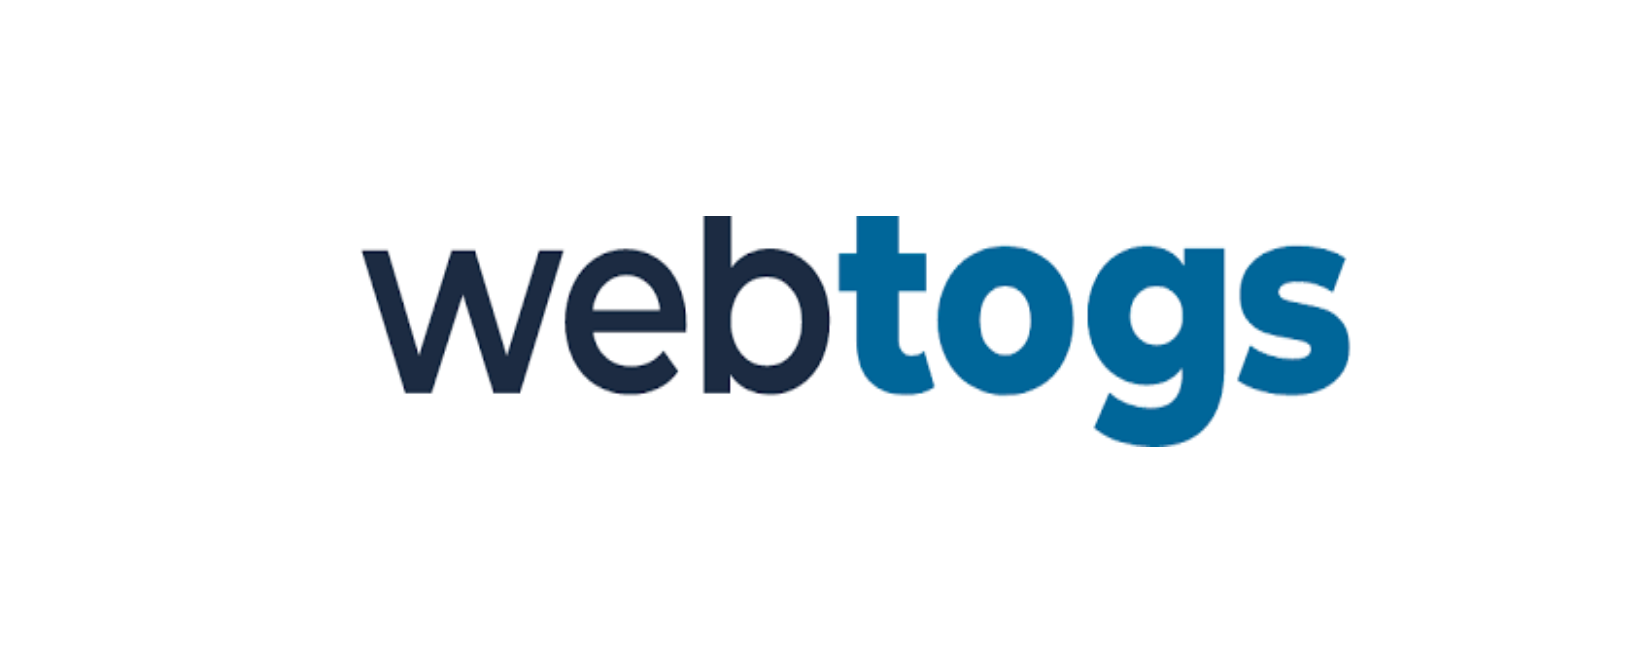 Webtogs Discount Code 2021